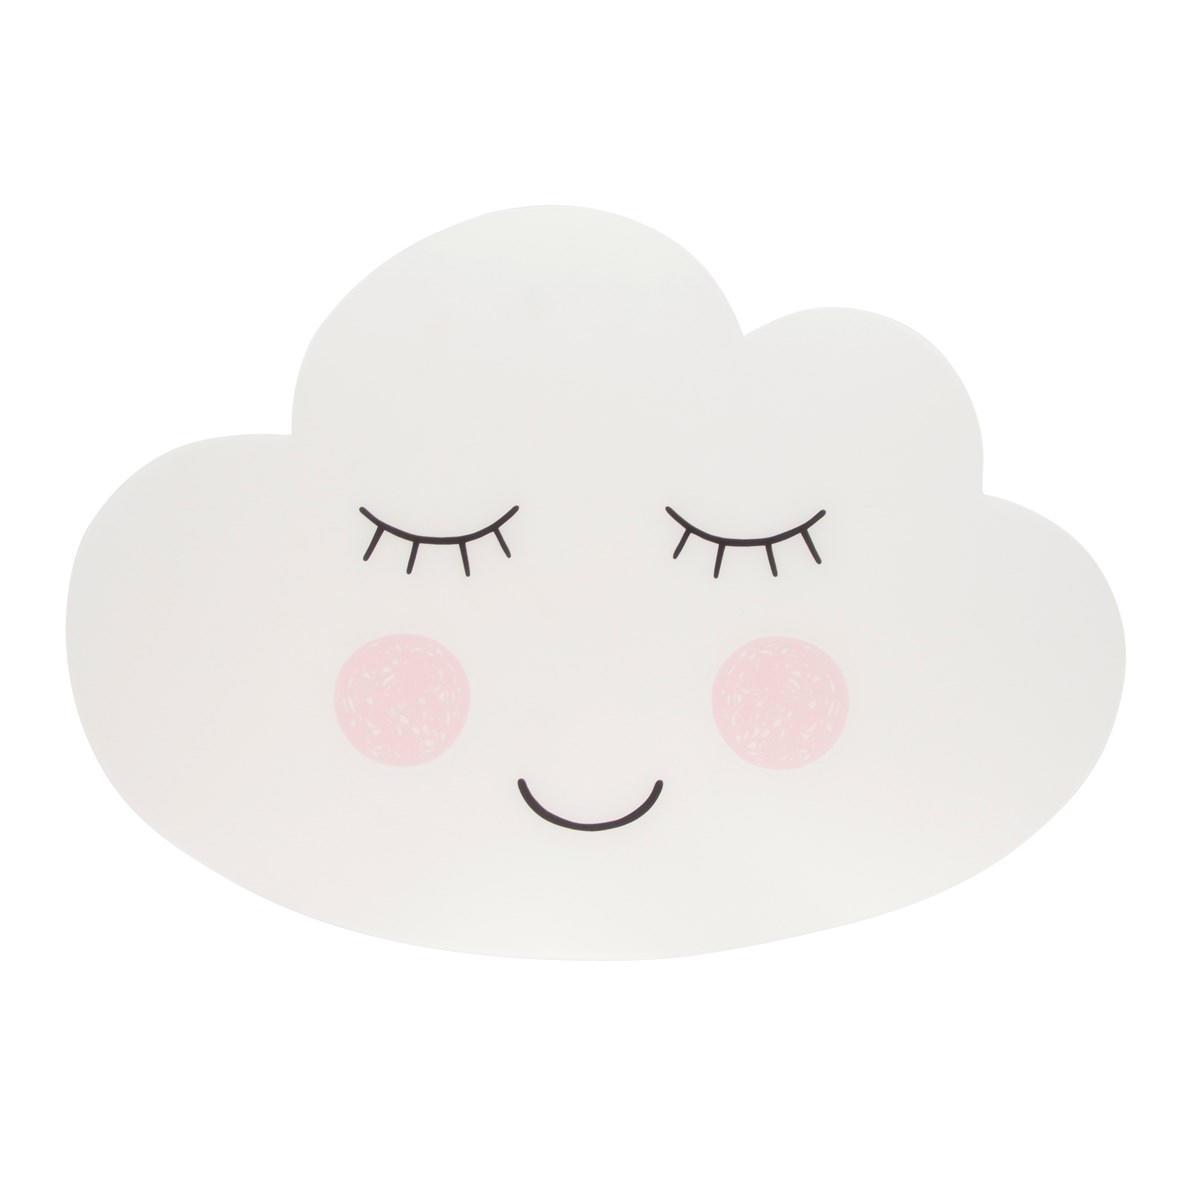 sass & belle Prostírání Cloud, bílá barva, plast